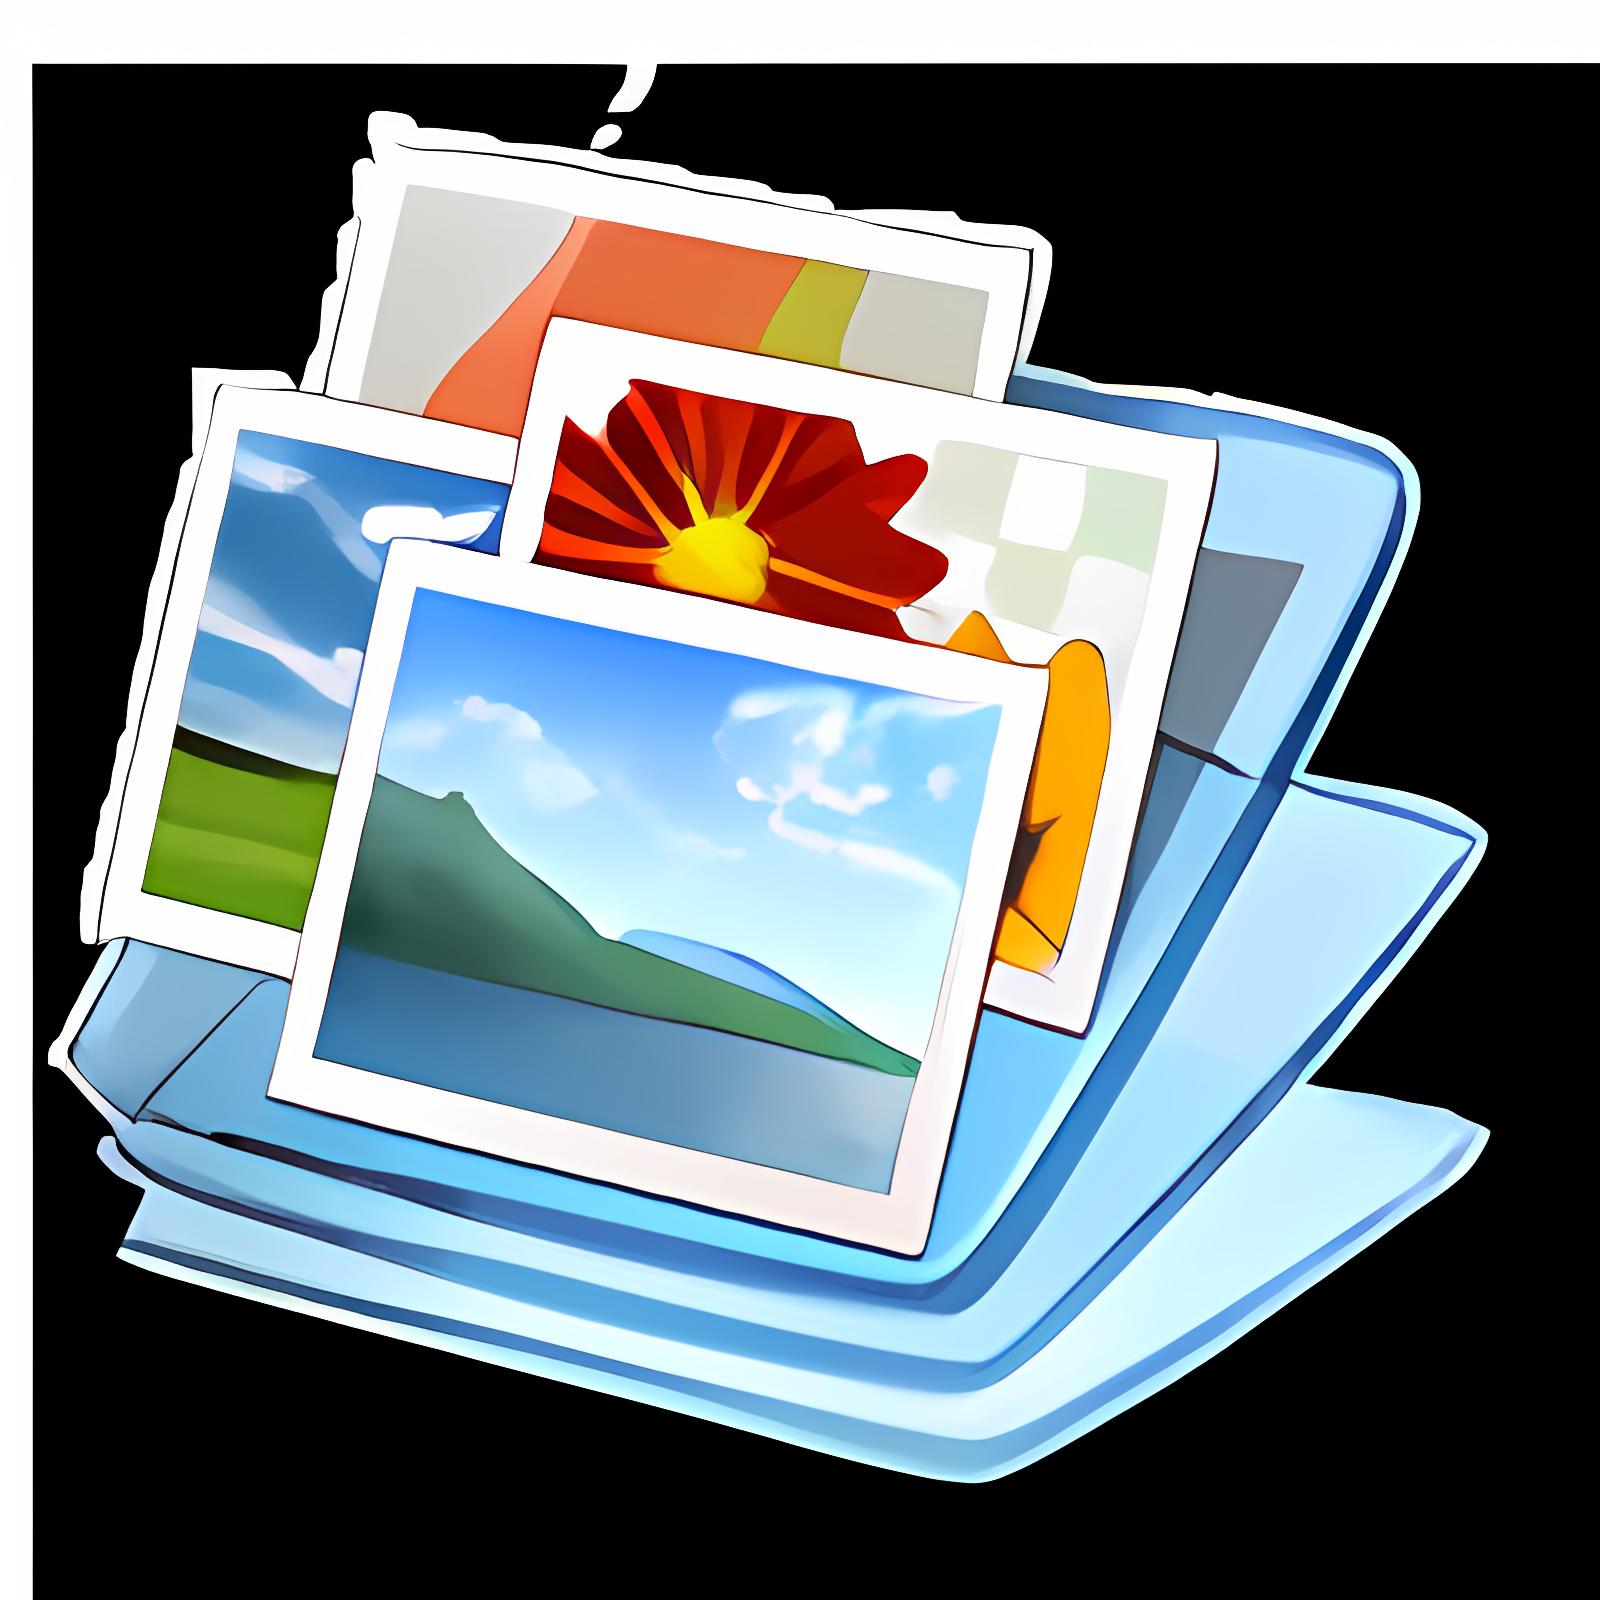 XeIMG Image Editor